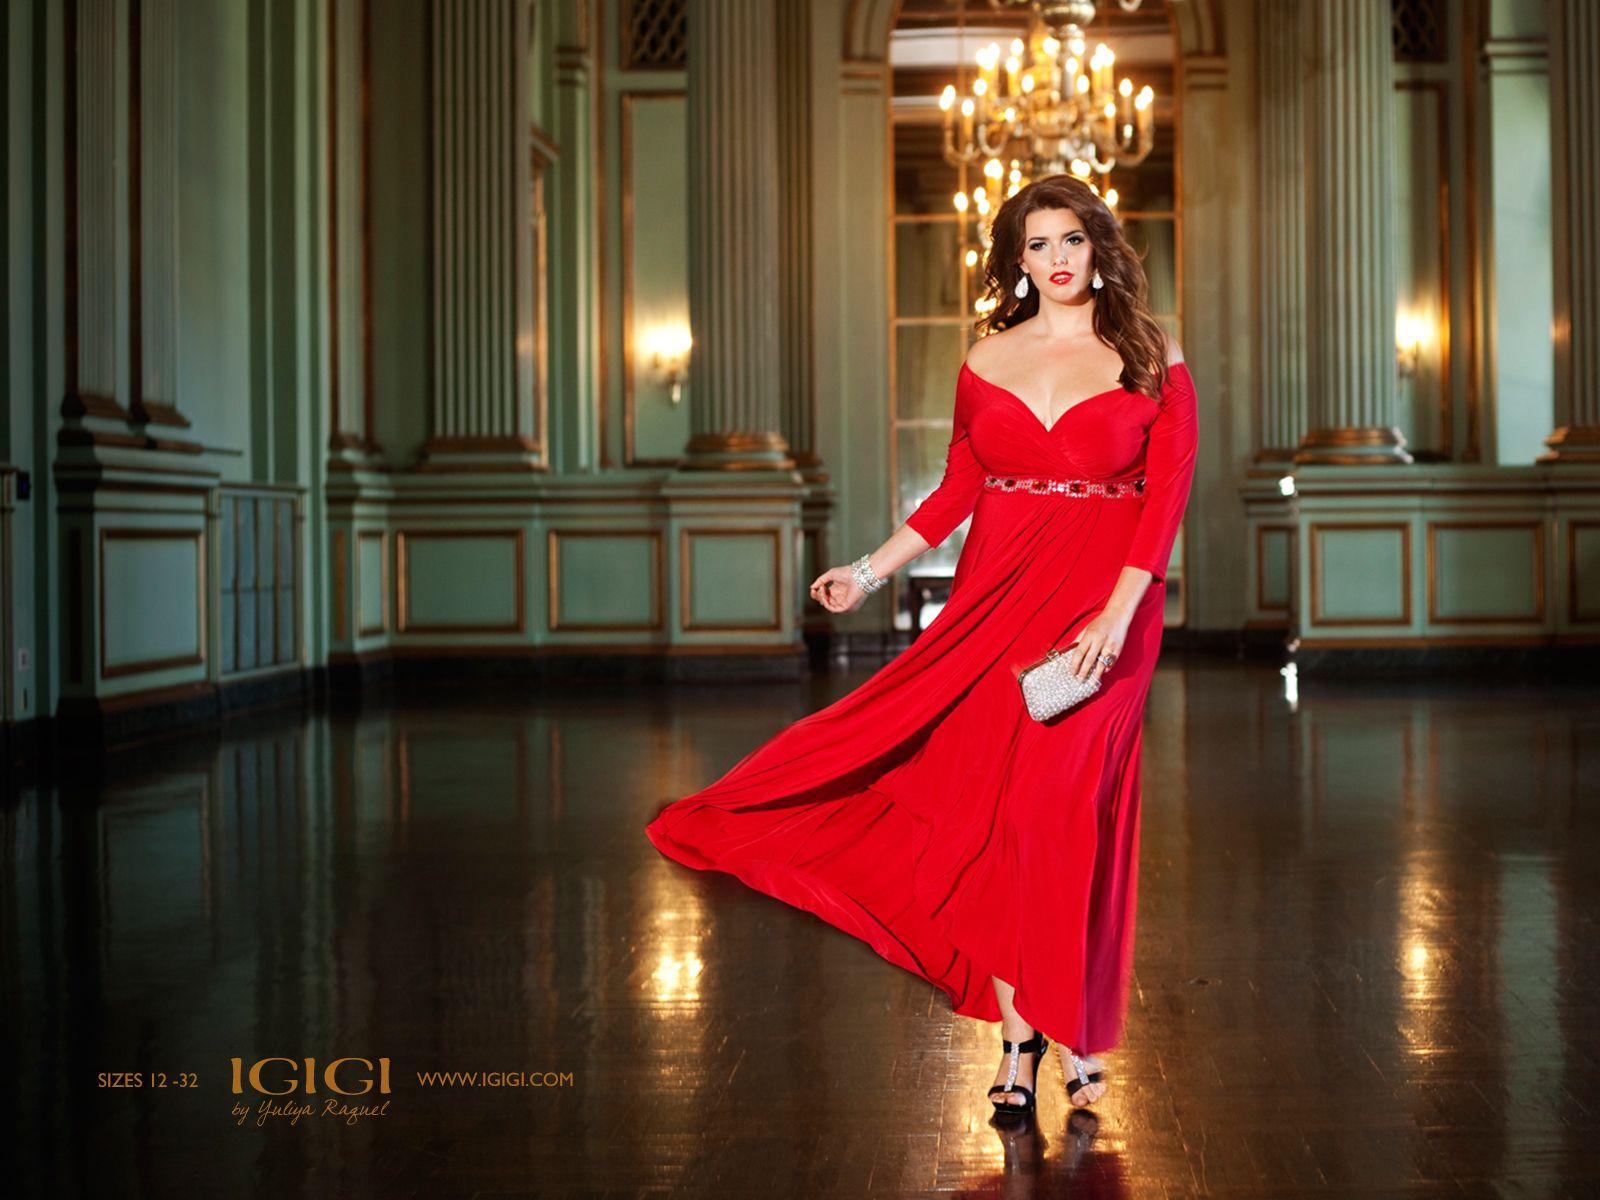 3cd26675c6b5 IGIGI by Yuliya Raquel's Nadine Jeweled Gown in Ruby. www.igigi.com ...